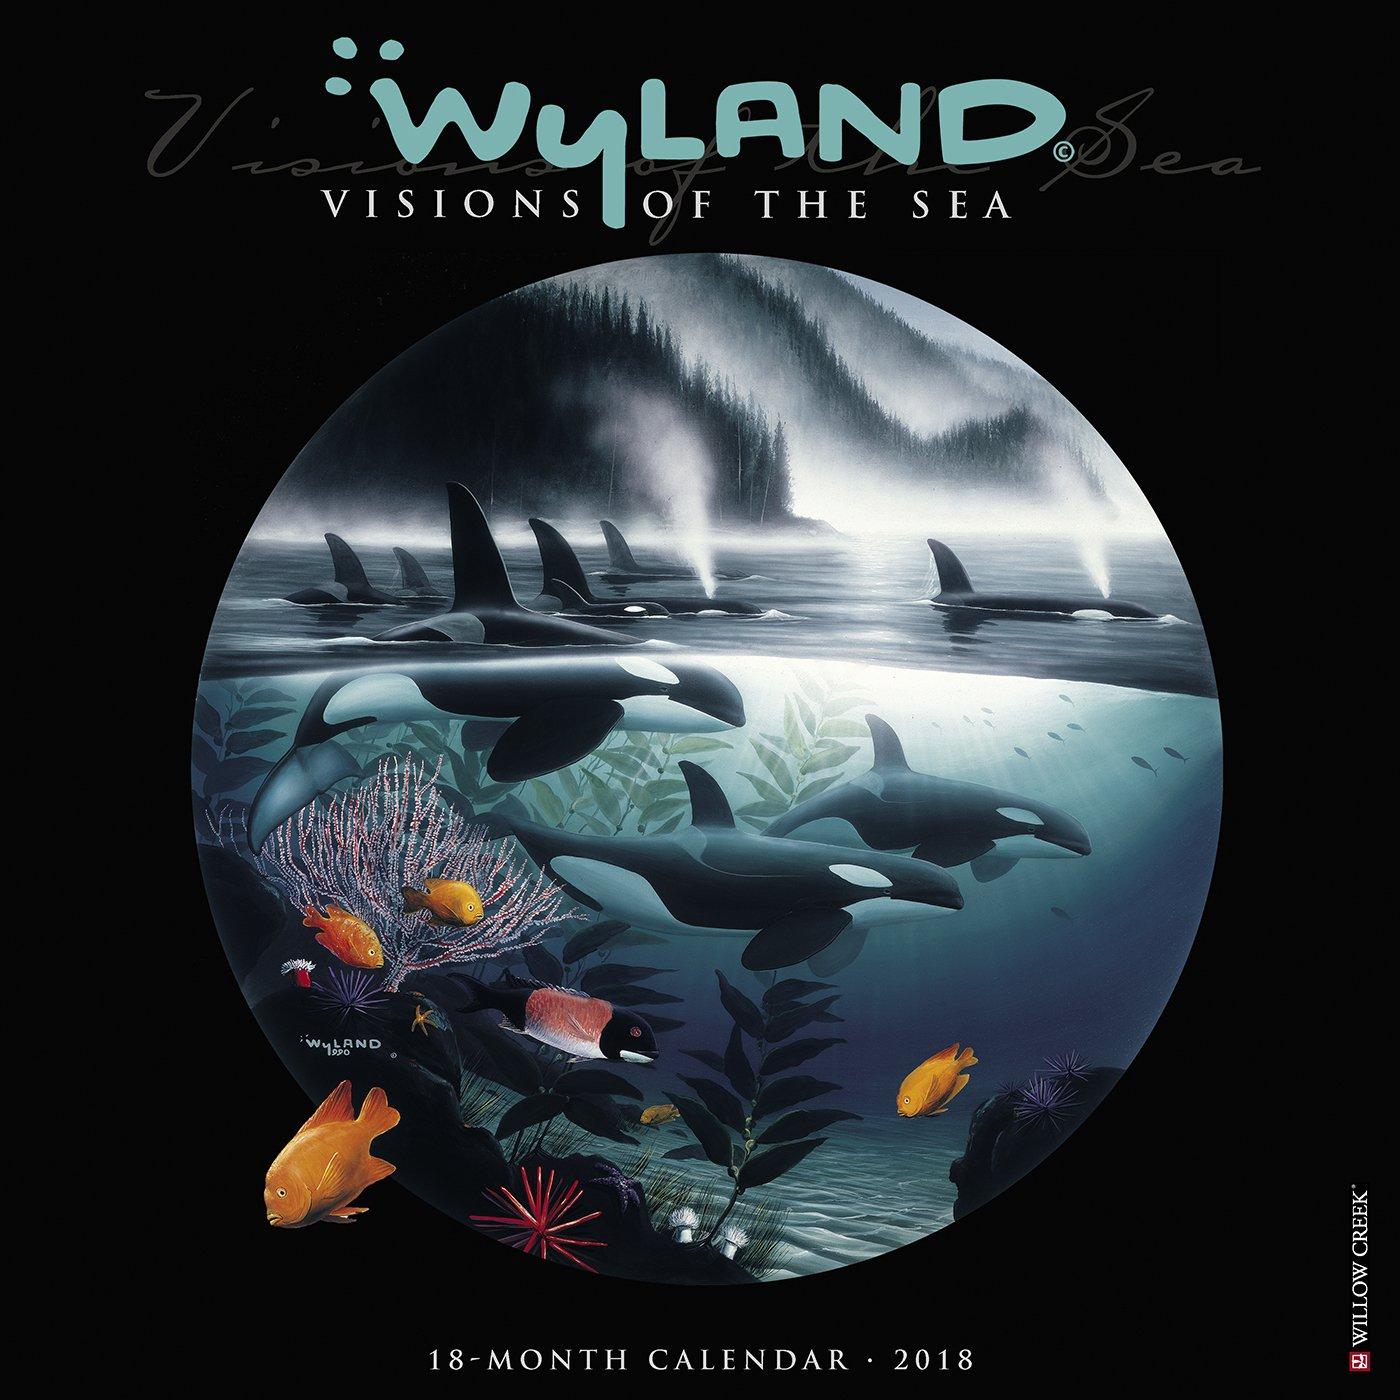 Wyland Visions of the Sea 2018 Calendar pdf